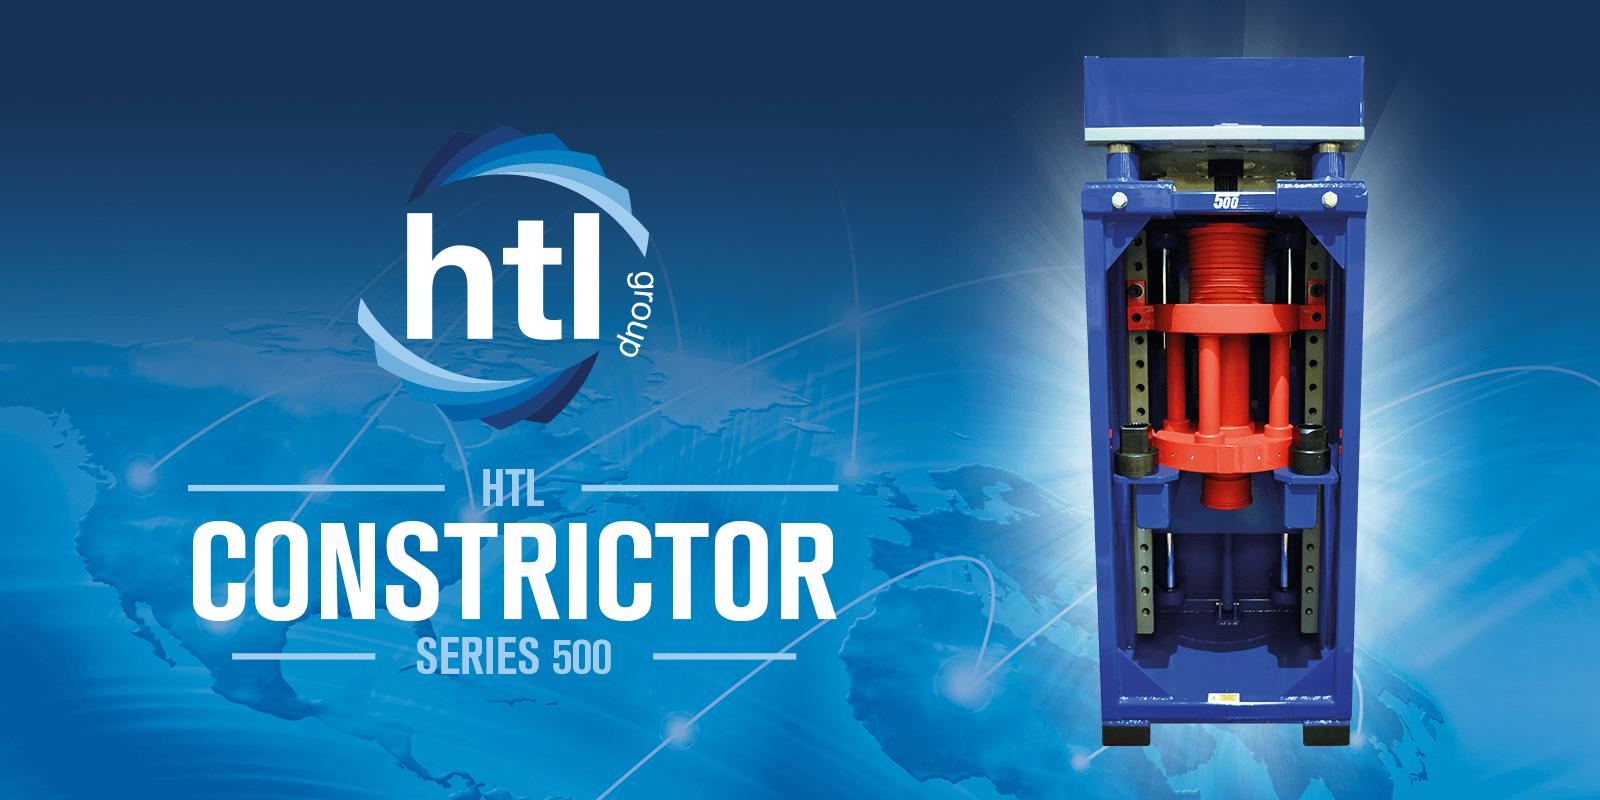 HTL Constrictor 500